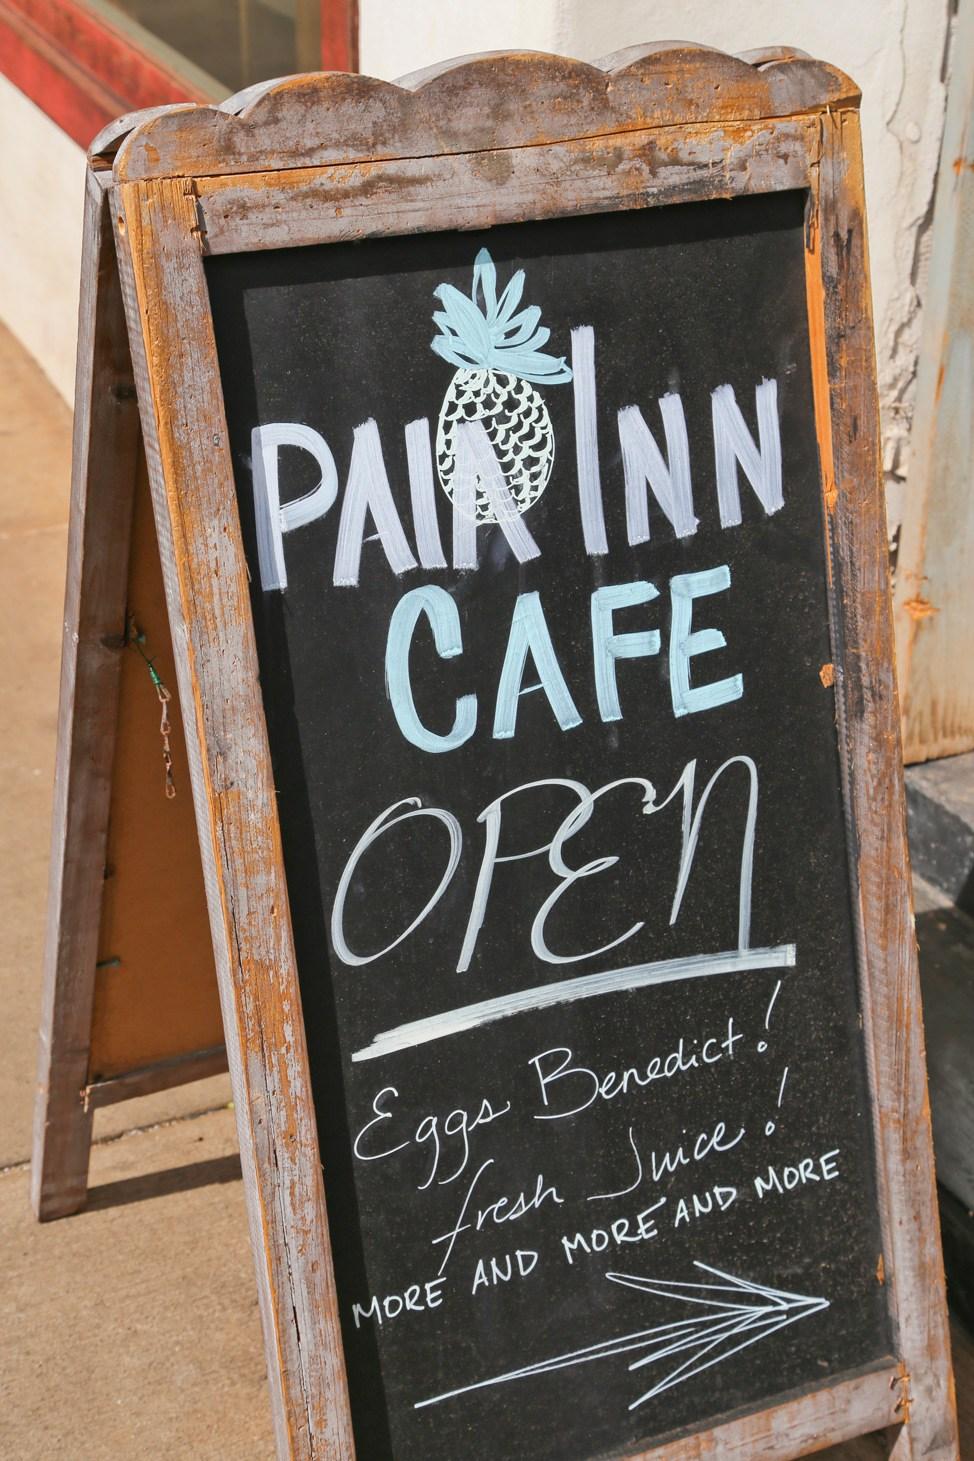 Paia Inn Cafe, Maui